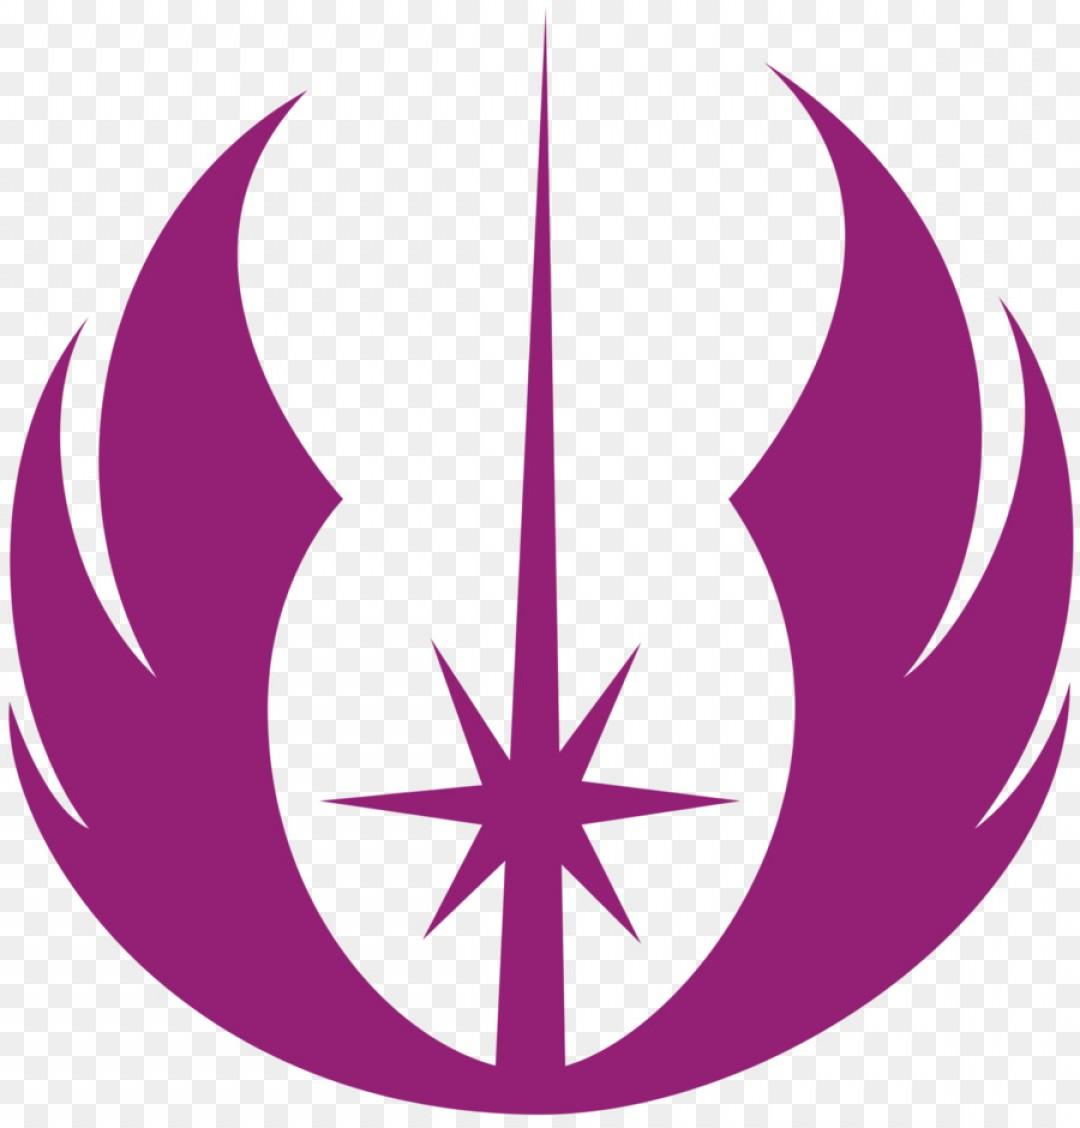 1080x1128 Png Clone Wars The New Jedi Order Luke Skywalker Anaki Shopatcloth